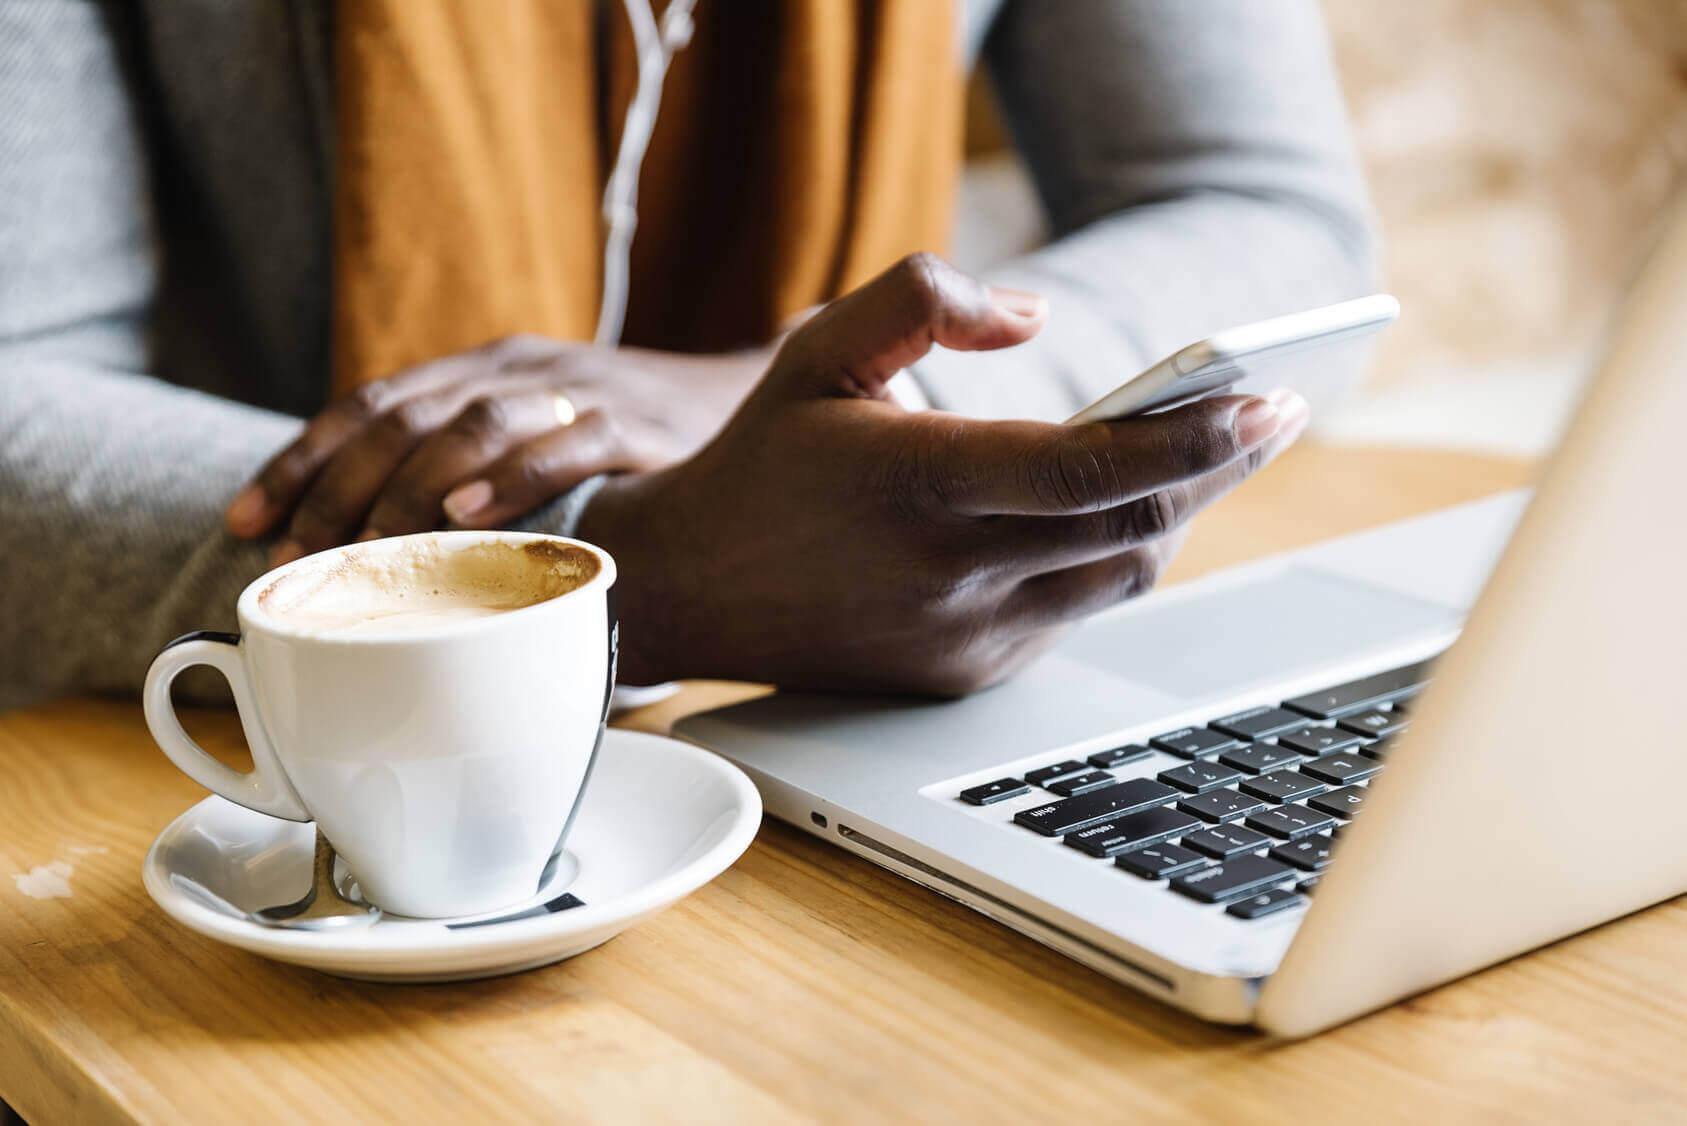 pomona college admissions essay help